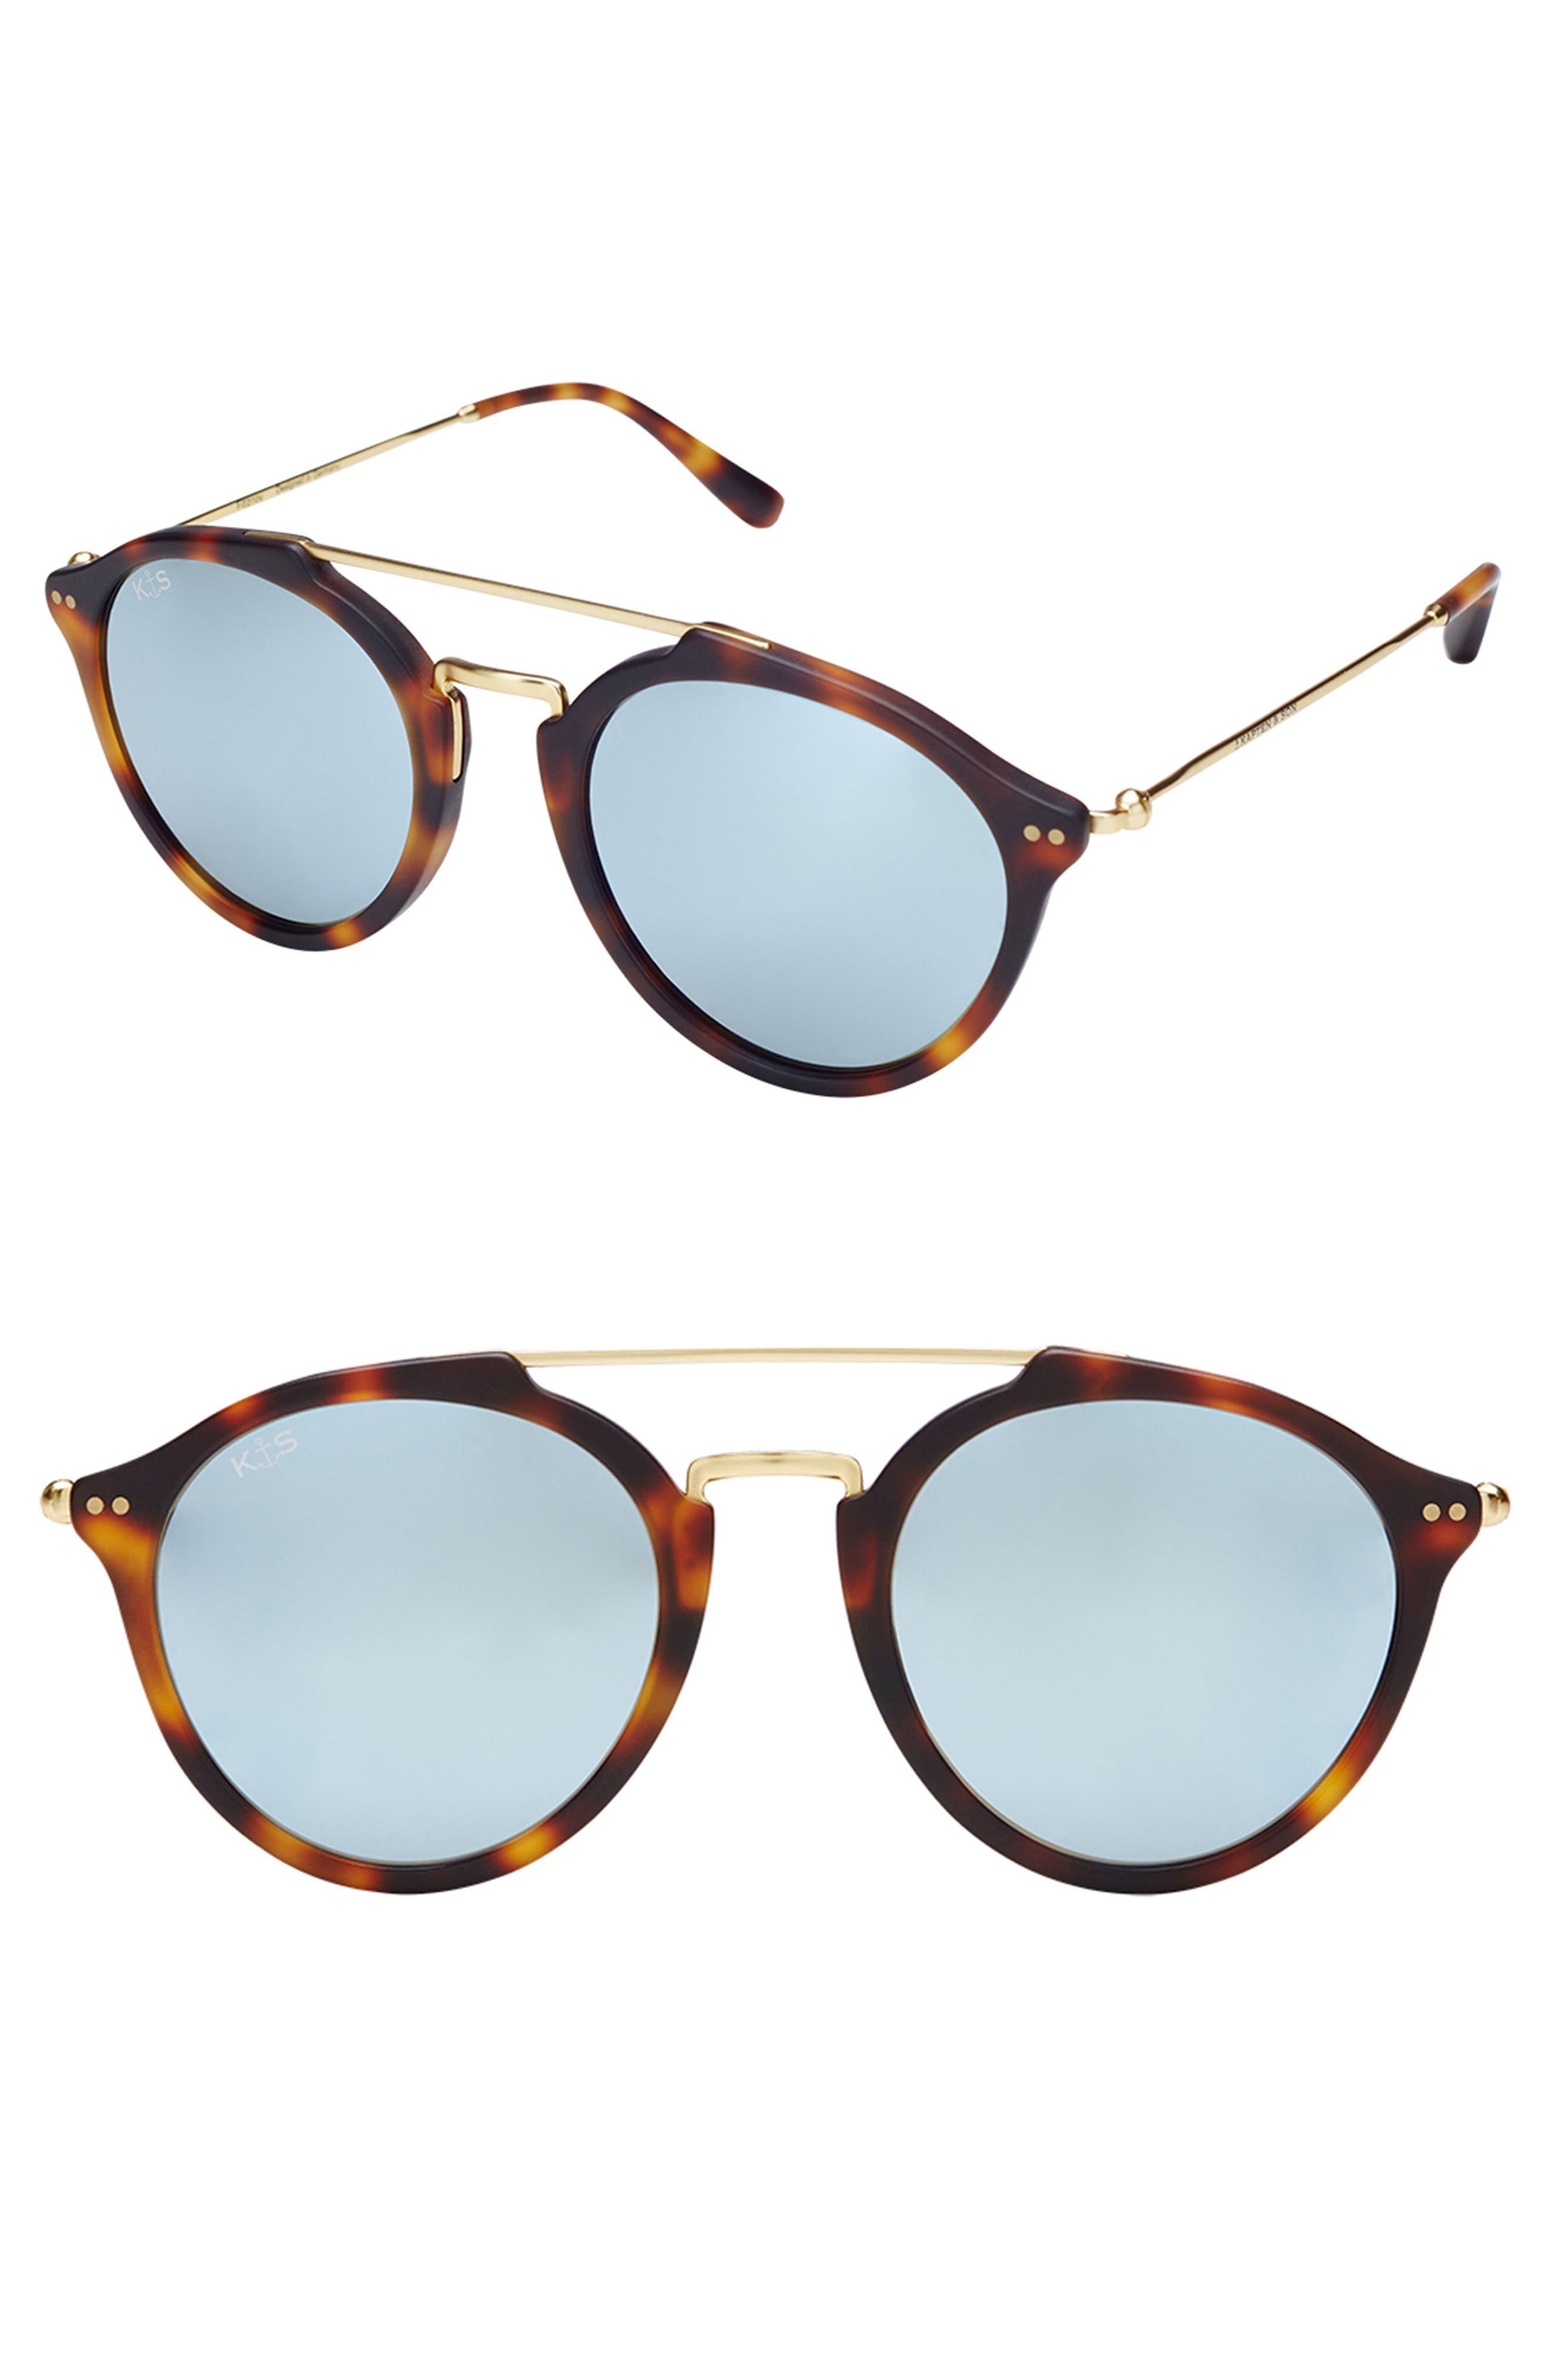 Kapten & Sons Fitzroy 48mm Sunglasses